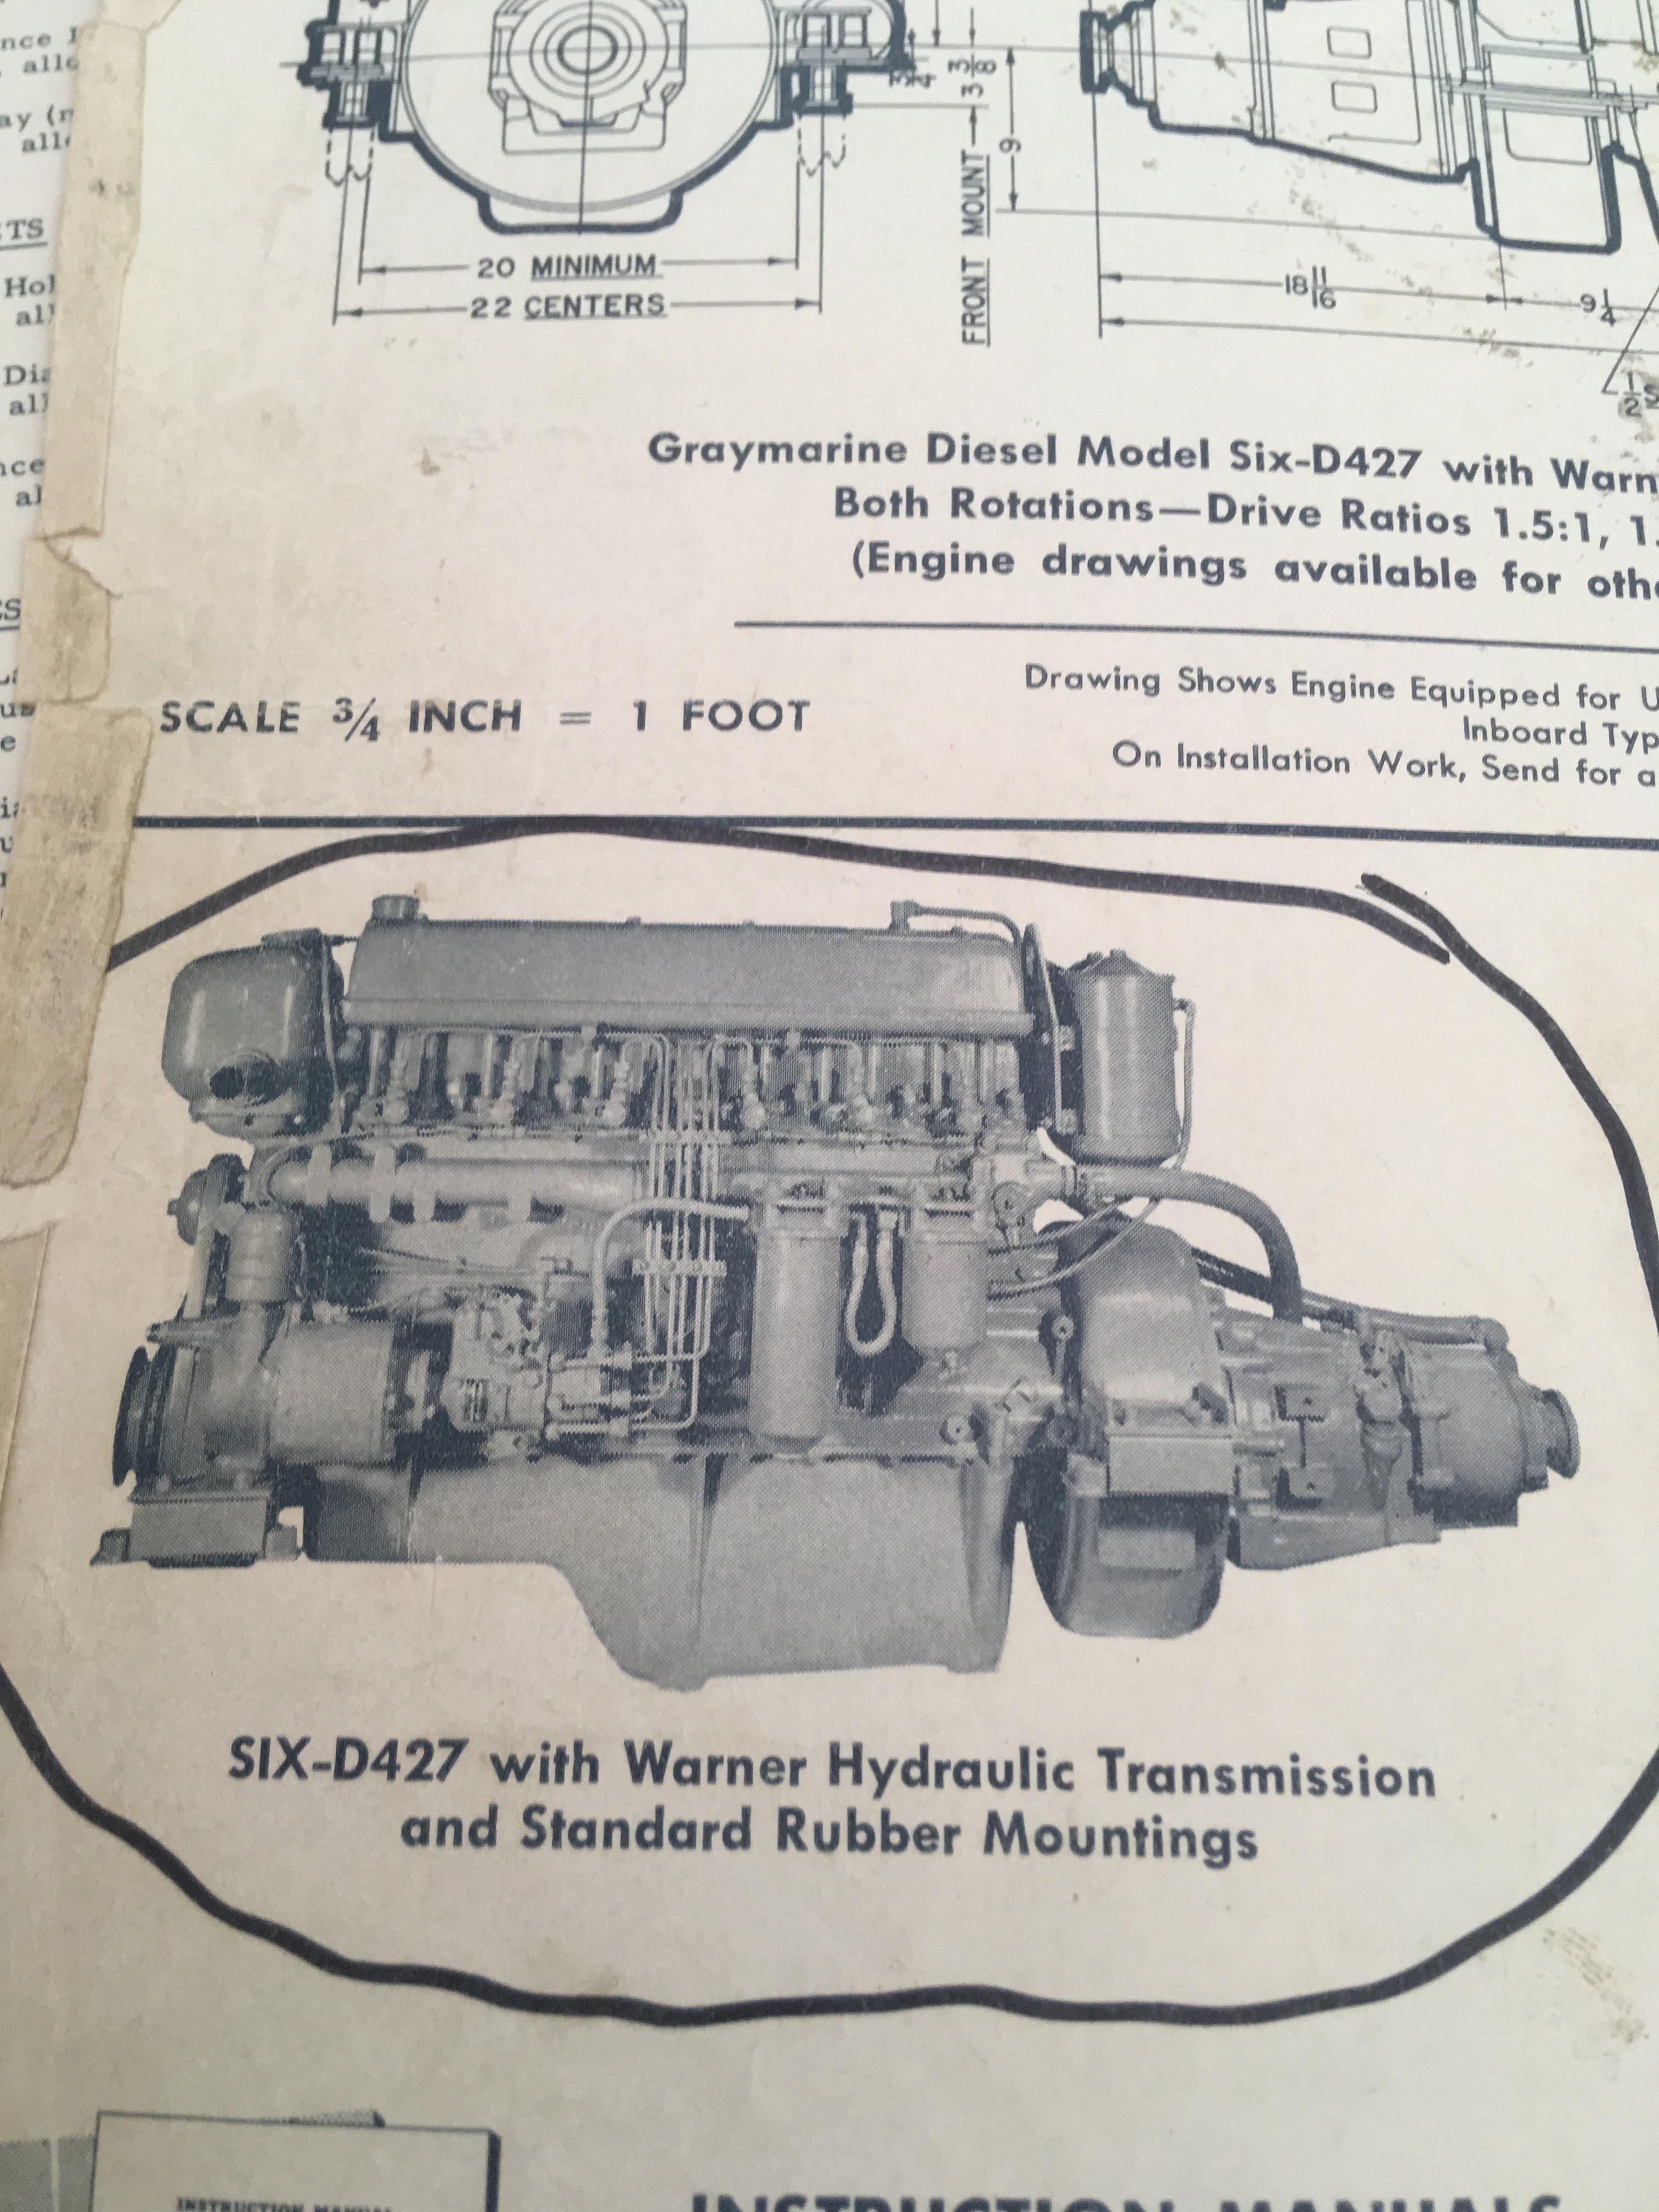 gray marine engine diagram all wiring diagram Chevrolet Tie Rod Diagram thetis engines 2 x graymarine 4 cycle 6 cyl (installed 1960 chevrolet engine diagram gray marine engine diagram